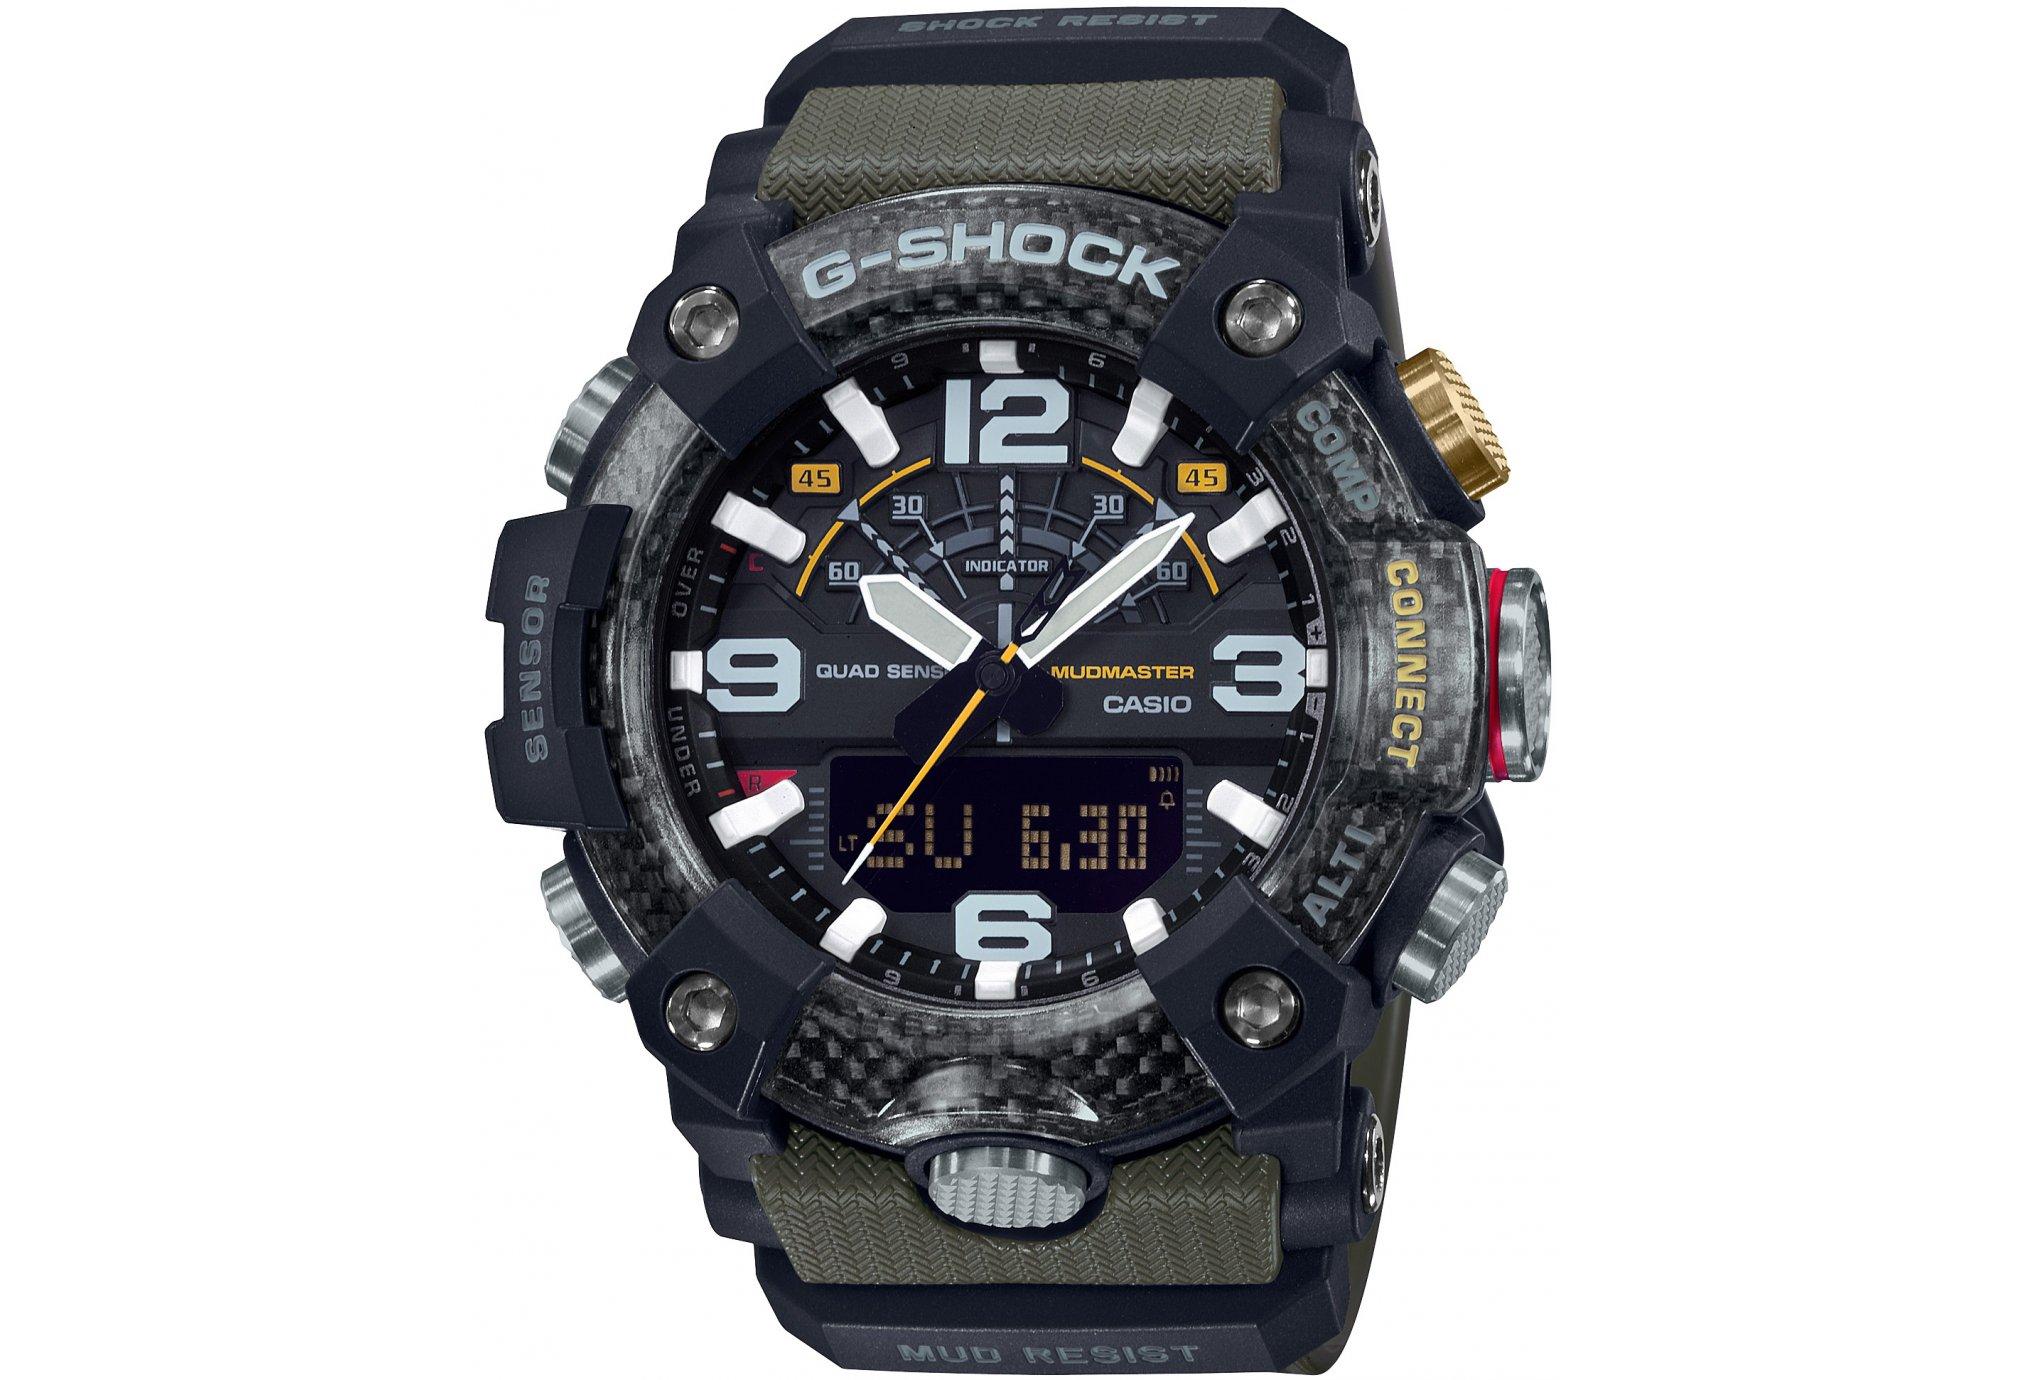 Casio G-Shock gg-b100-1a3er montres de sport